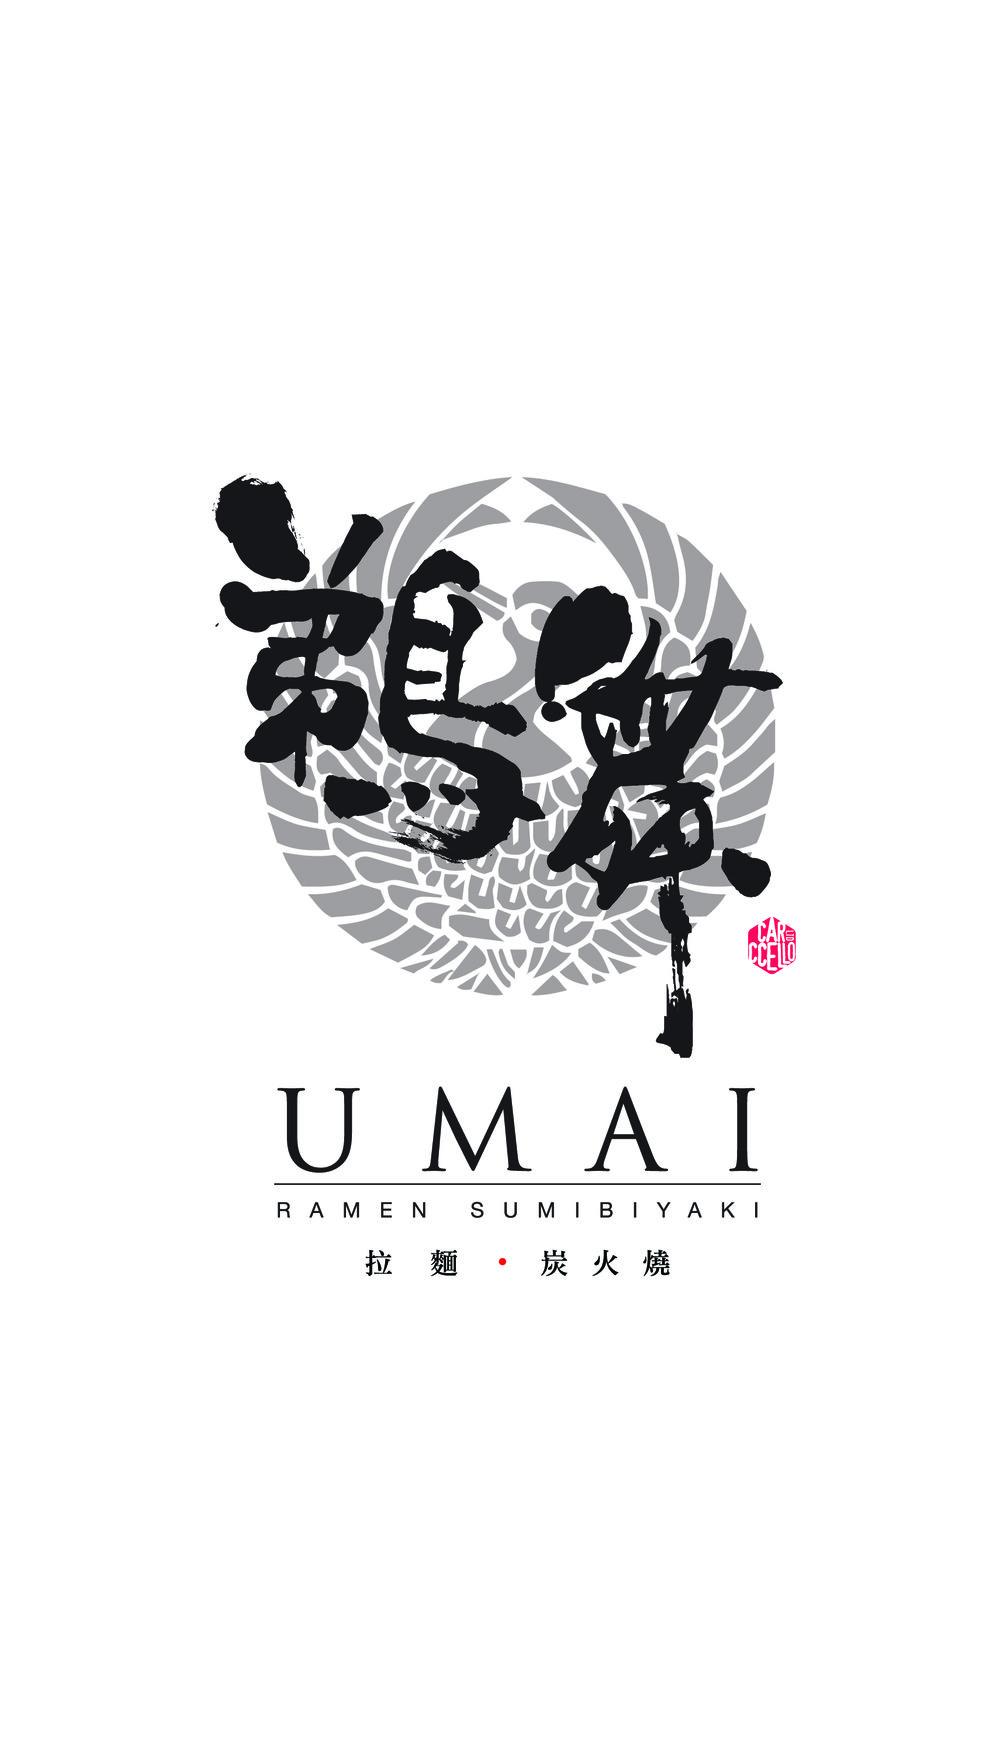 UMAI_logo_Blue_cs6.jpg